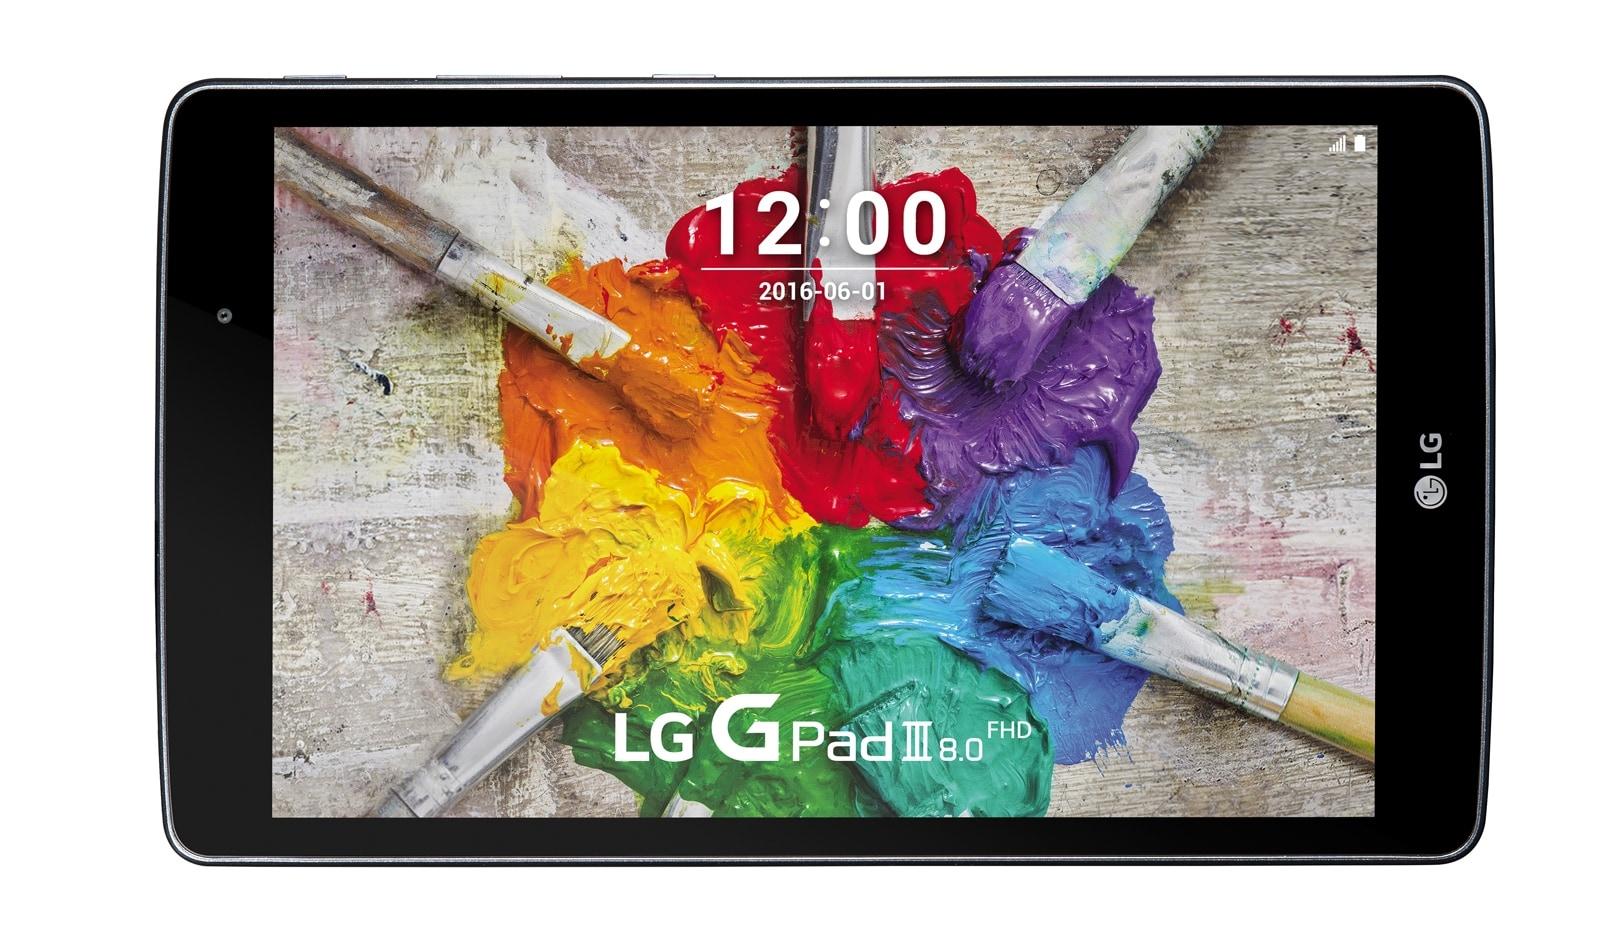 LG G Pad™ III 8 0 FHD | LG Canada